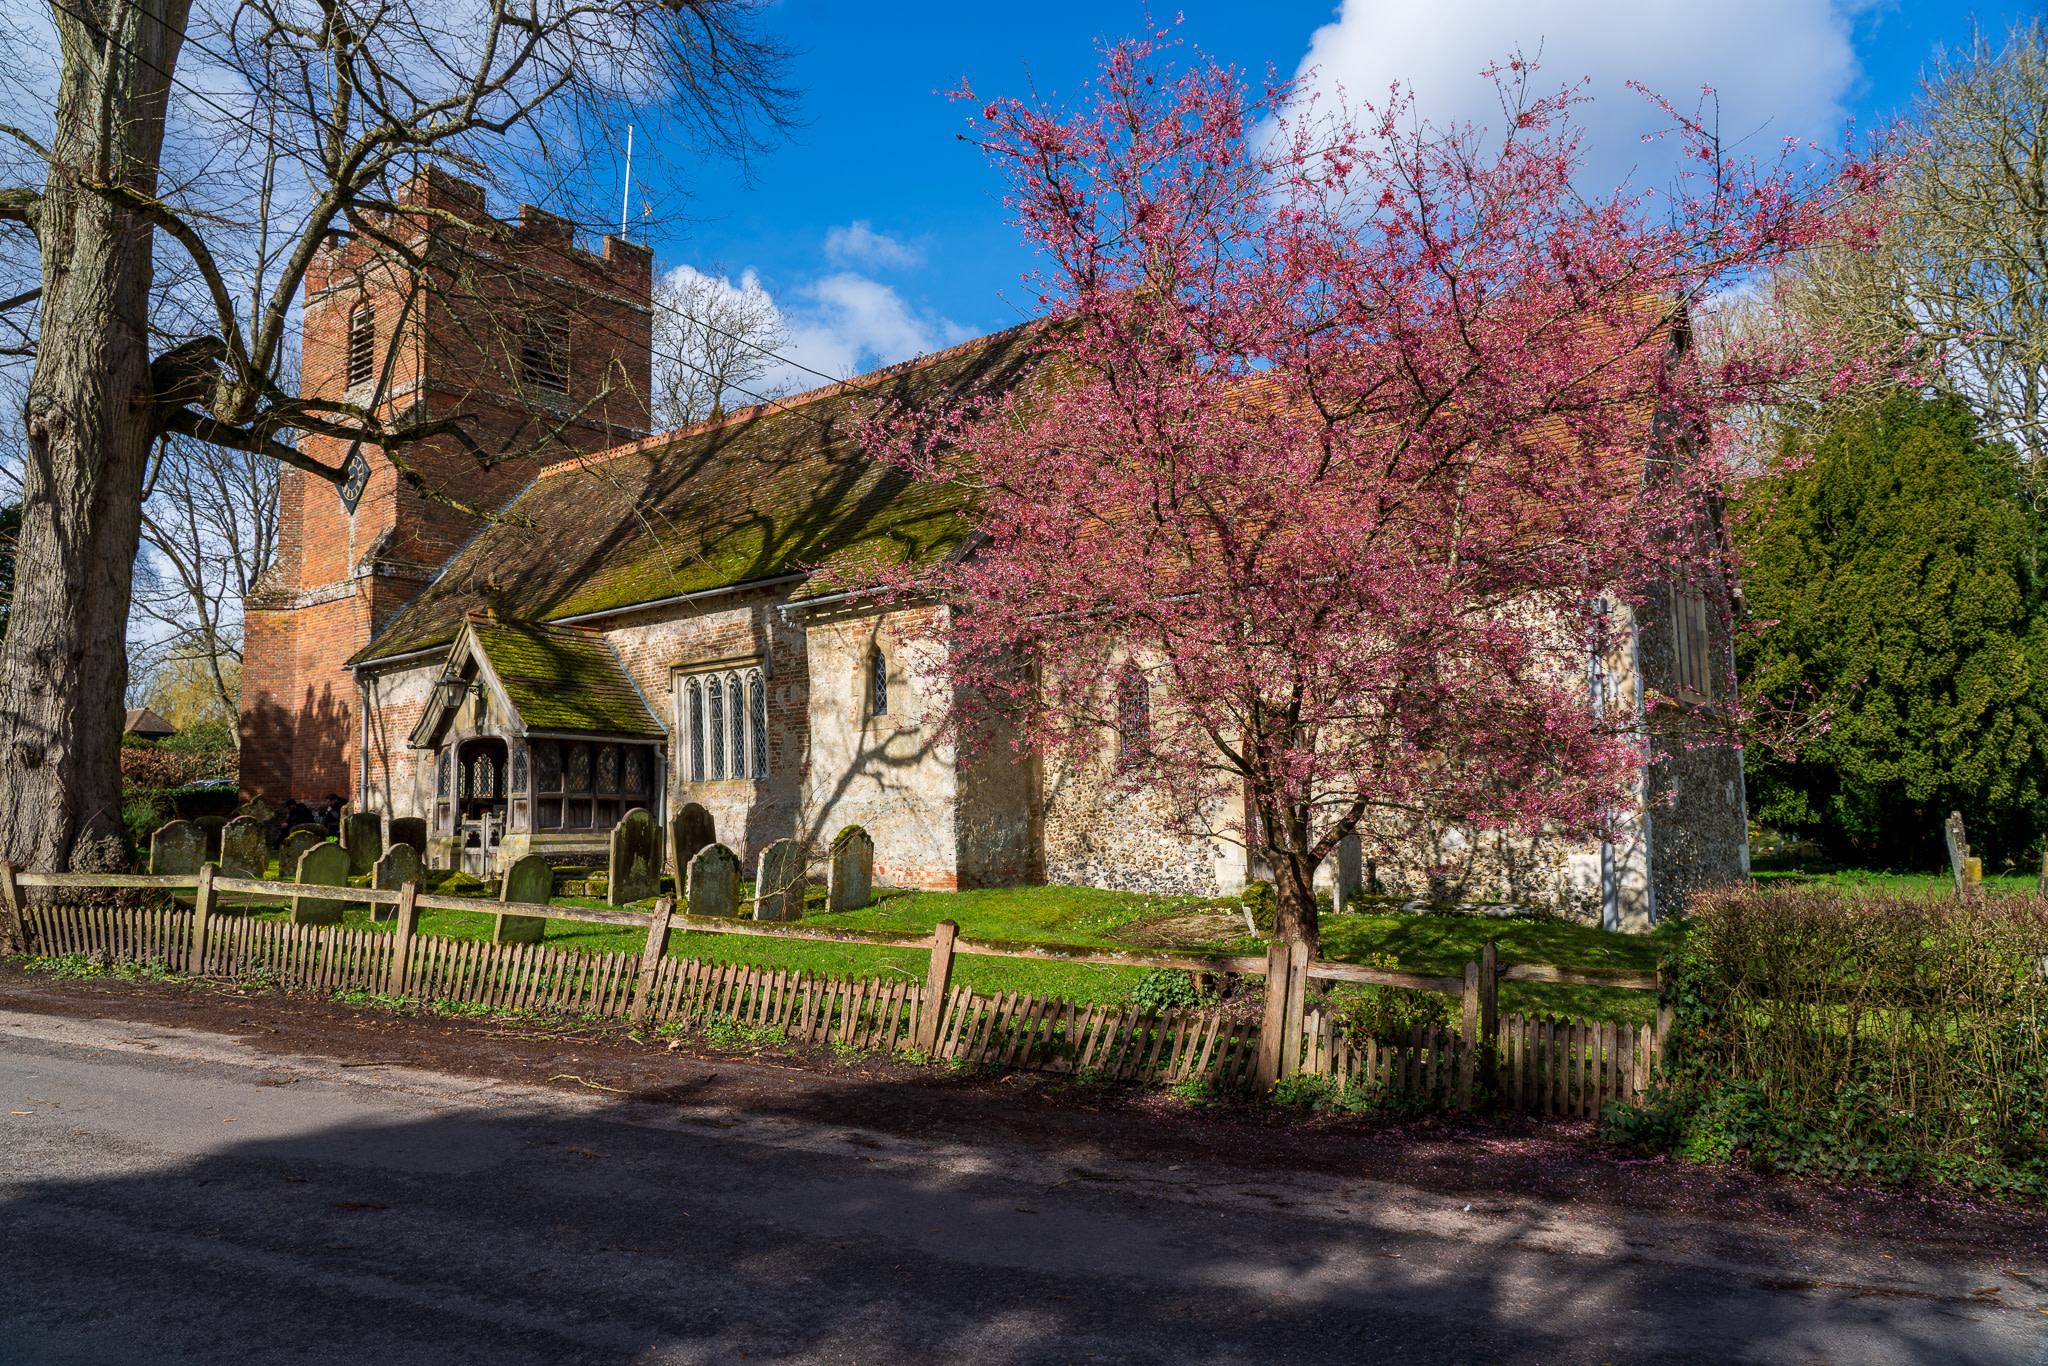 Rotherwick Church